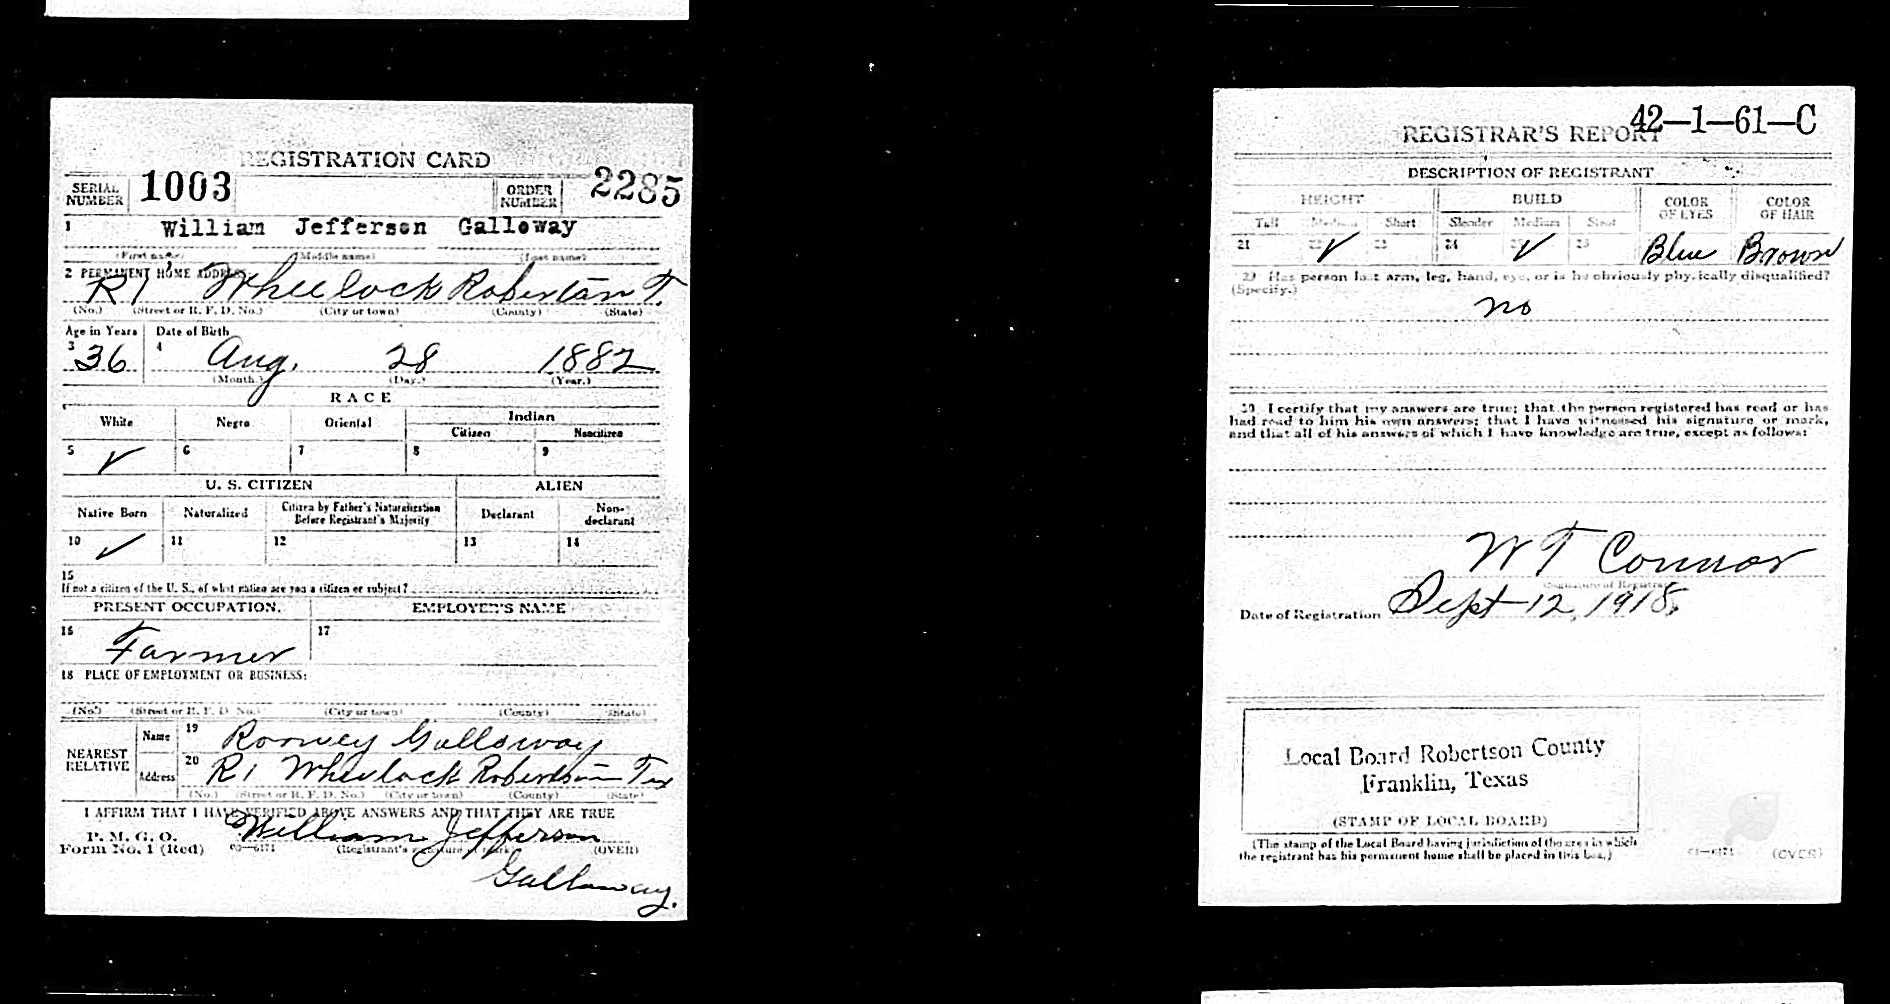 ww1-draft-card-from-ancestry